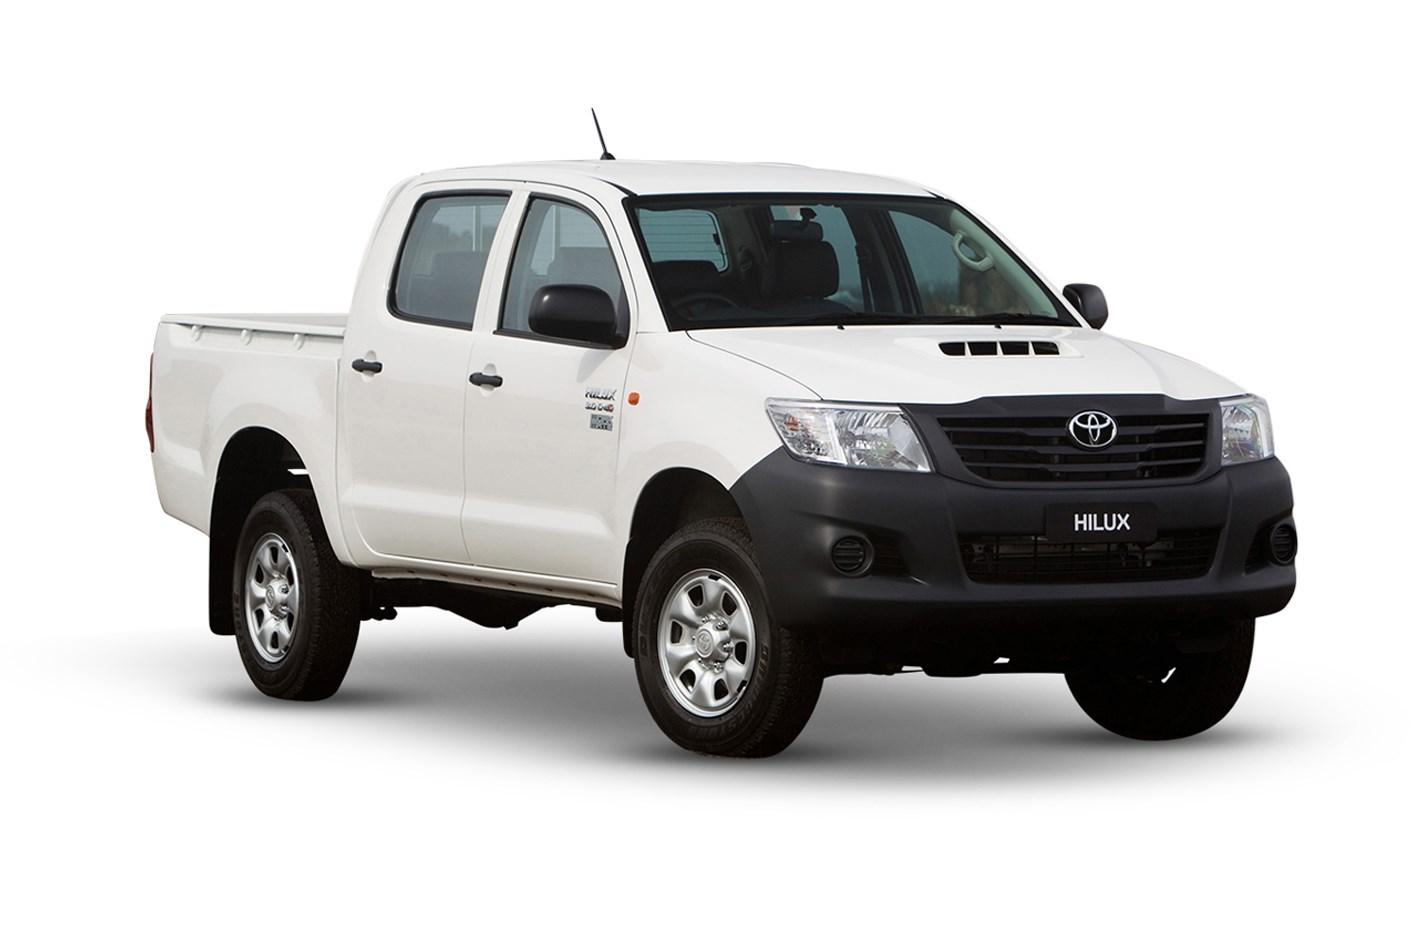 Toyota Hilux Backgrounds, Compatible - PC, Mobile, Gadgets| 1422x948 px